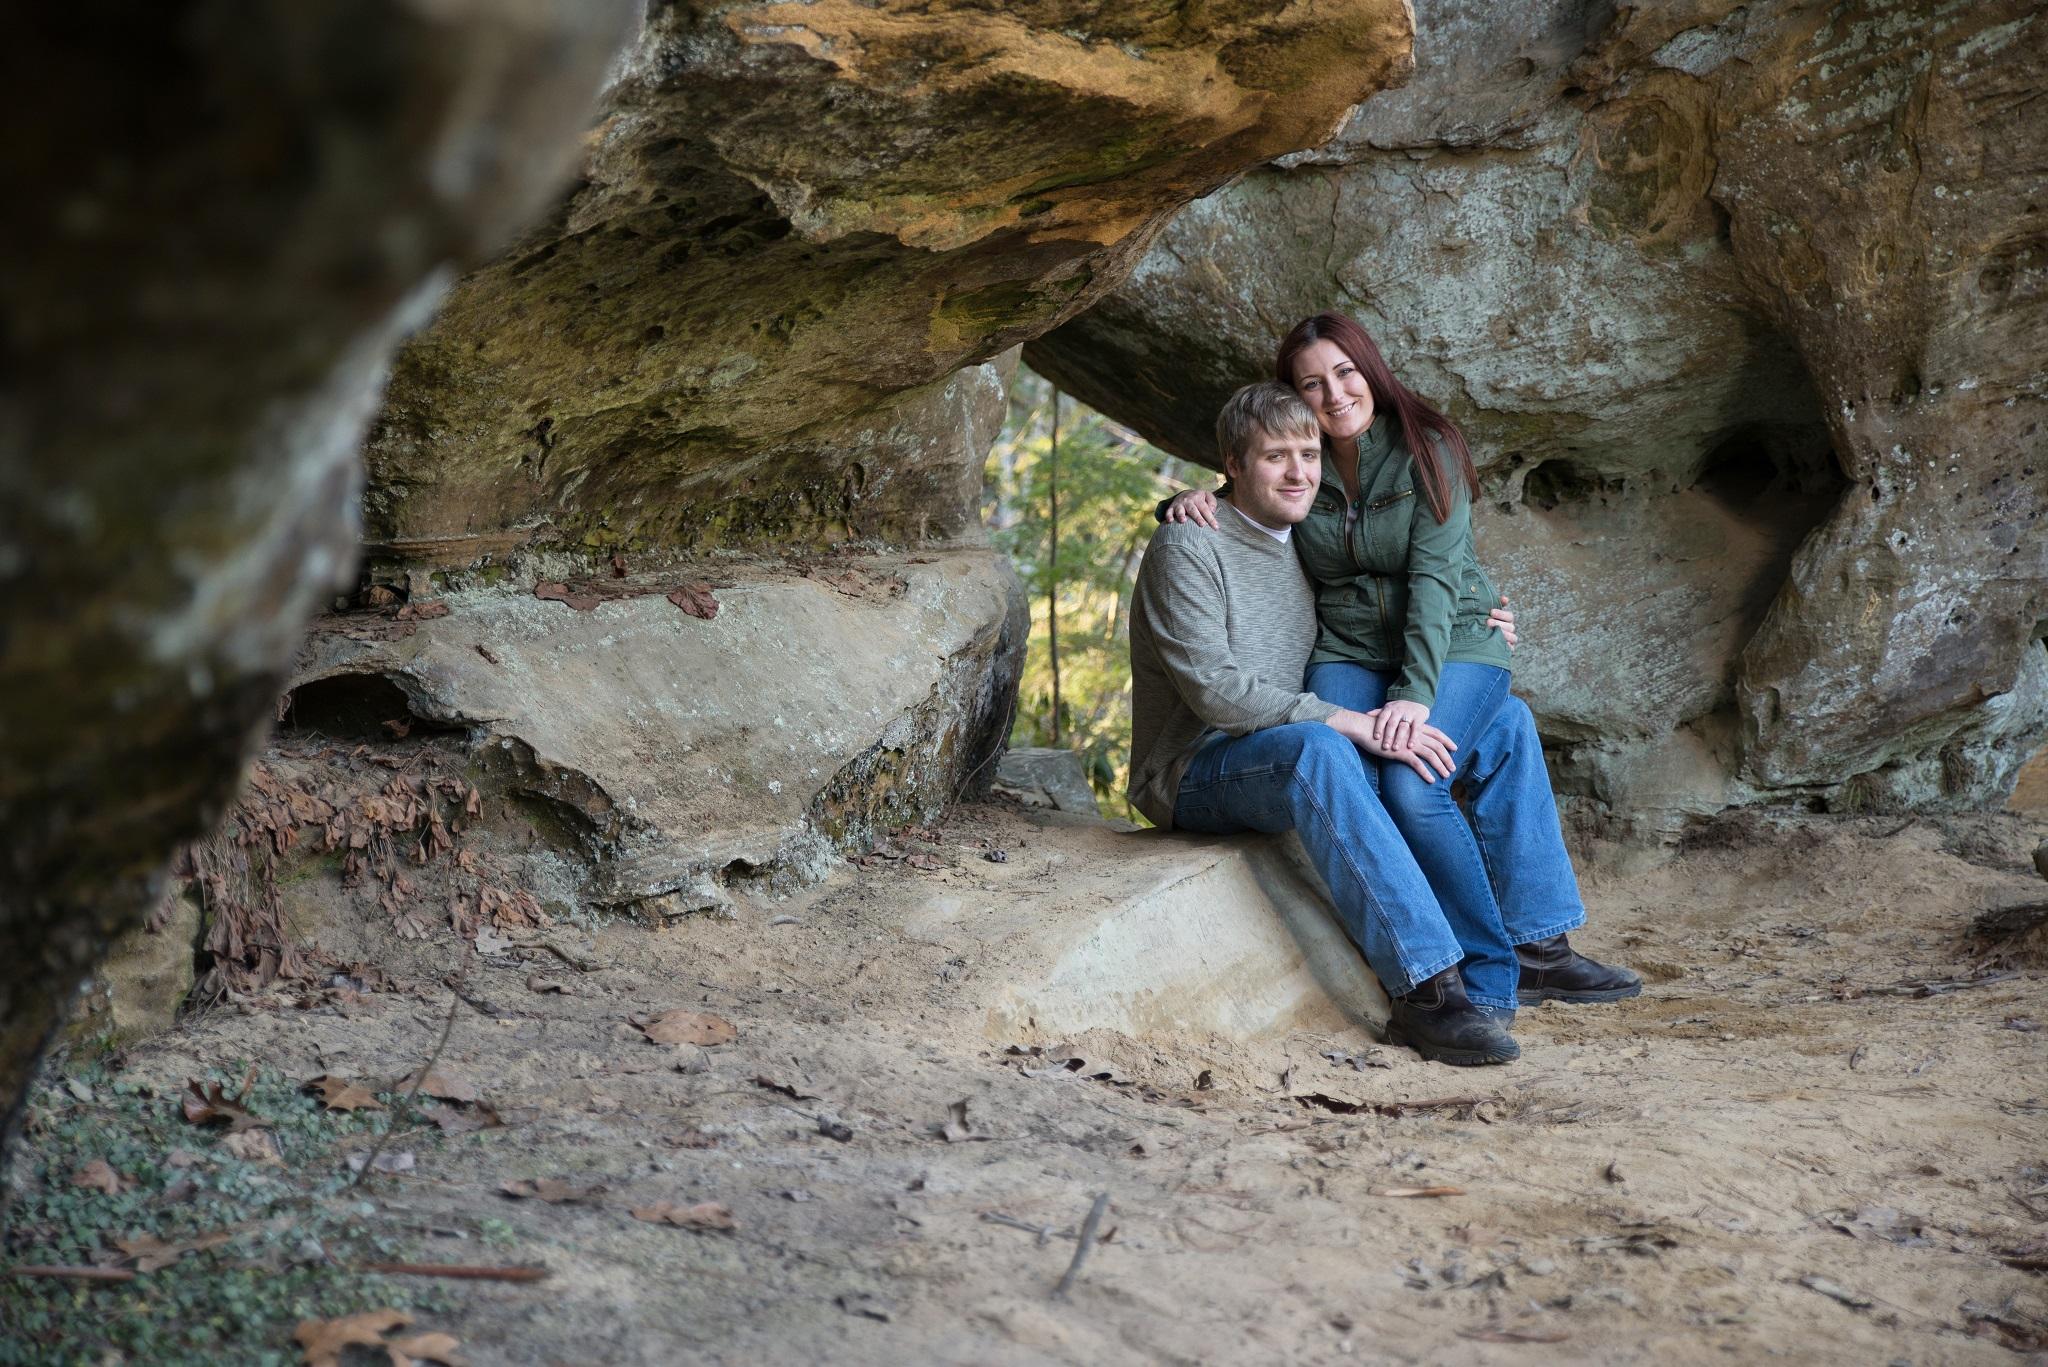 engagement photos, Kentucky engagement photos, KY wedding photographer, Georgetown KY wedding photographer, Red River Gorge